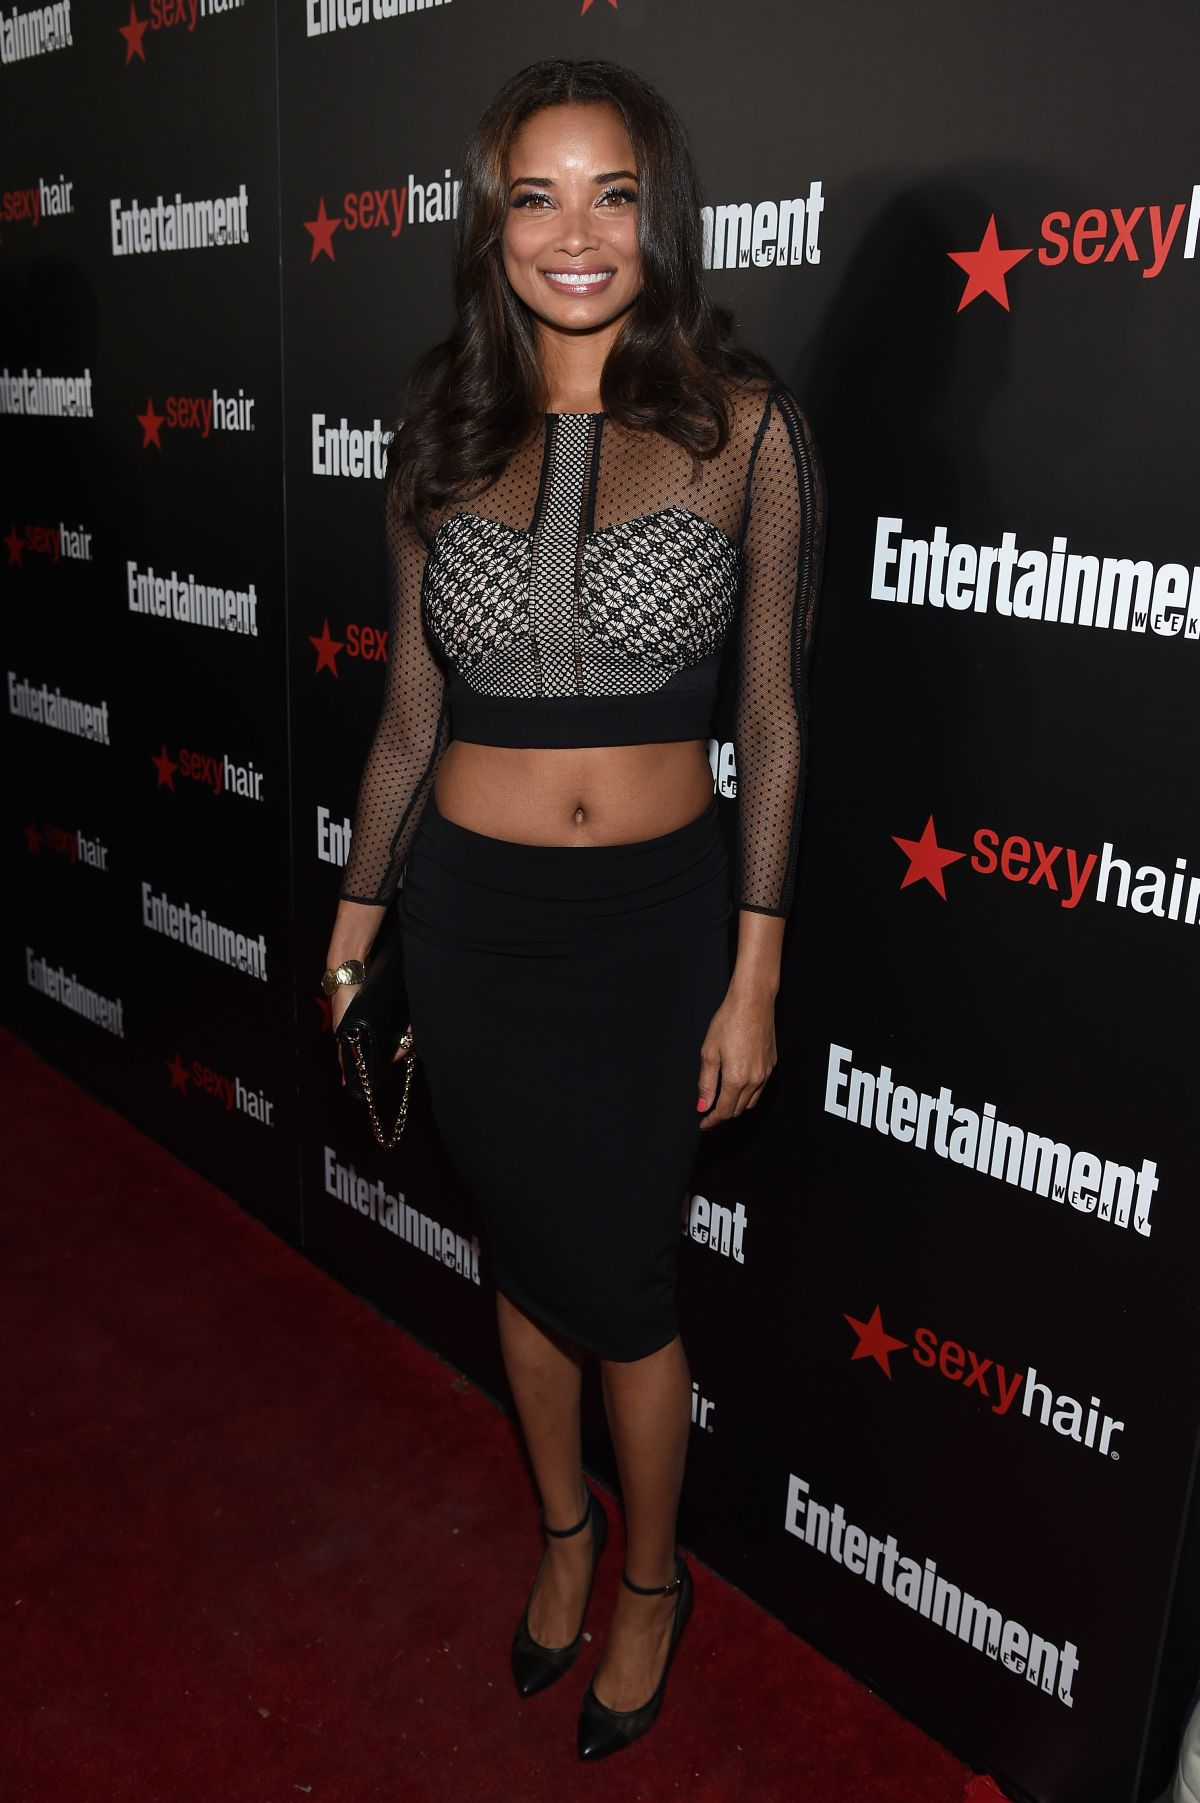 ROCHELLE AYTES at EW's Celebration Honoring 2015 SAG Awards Nominees